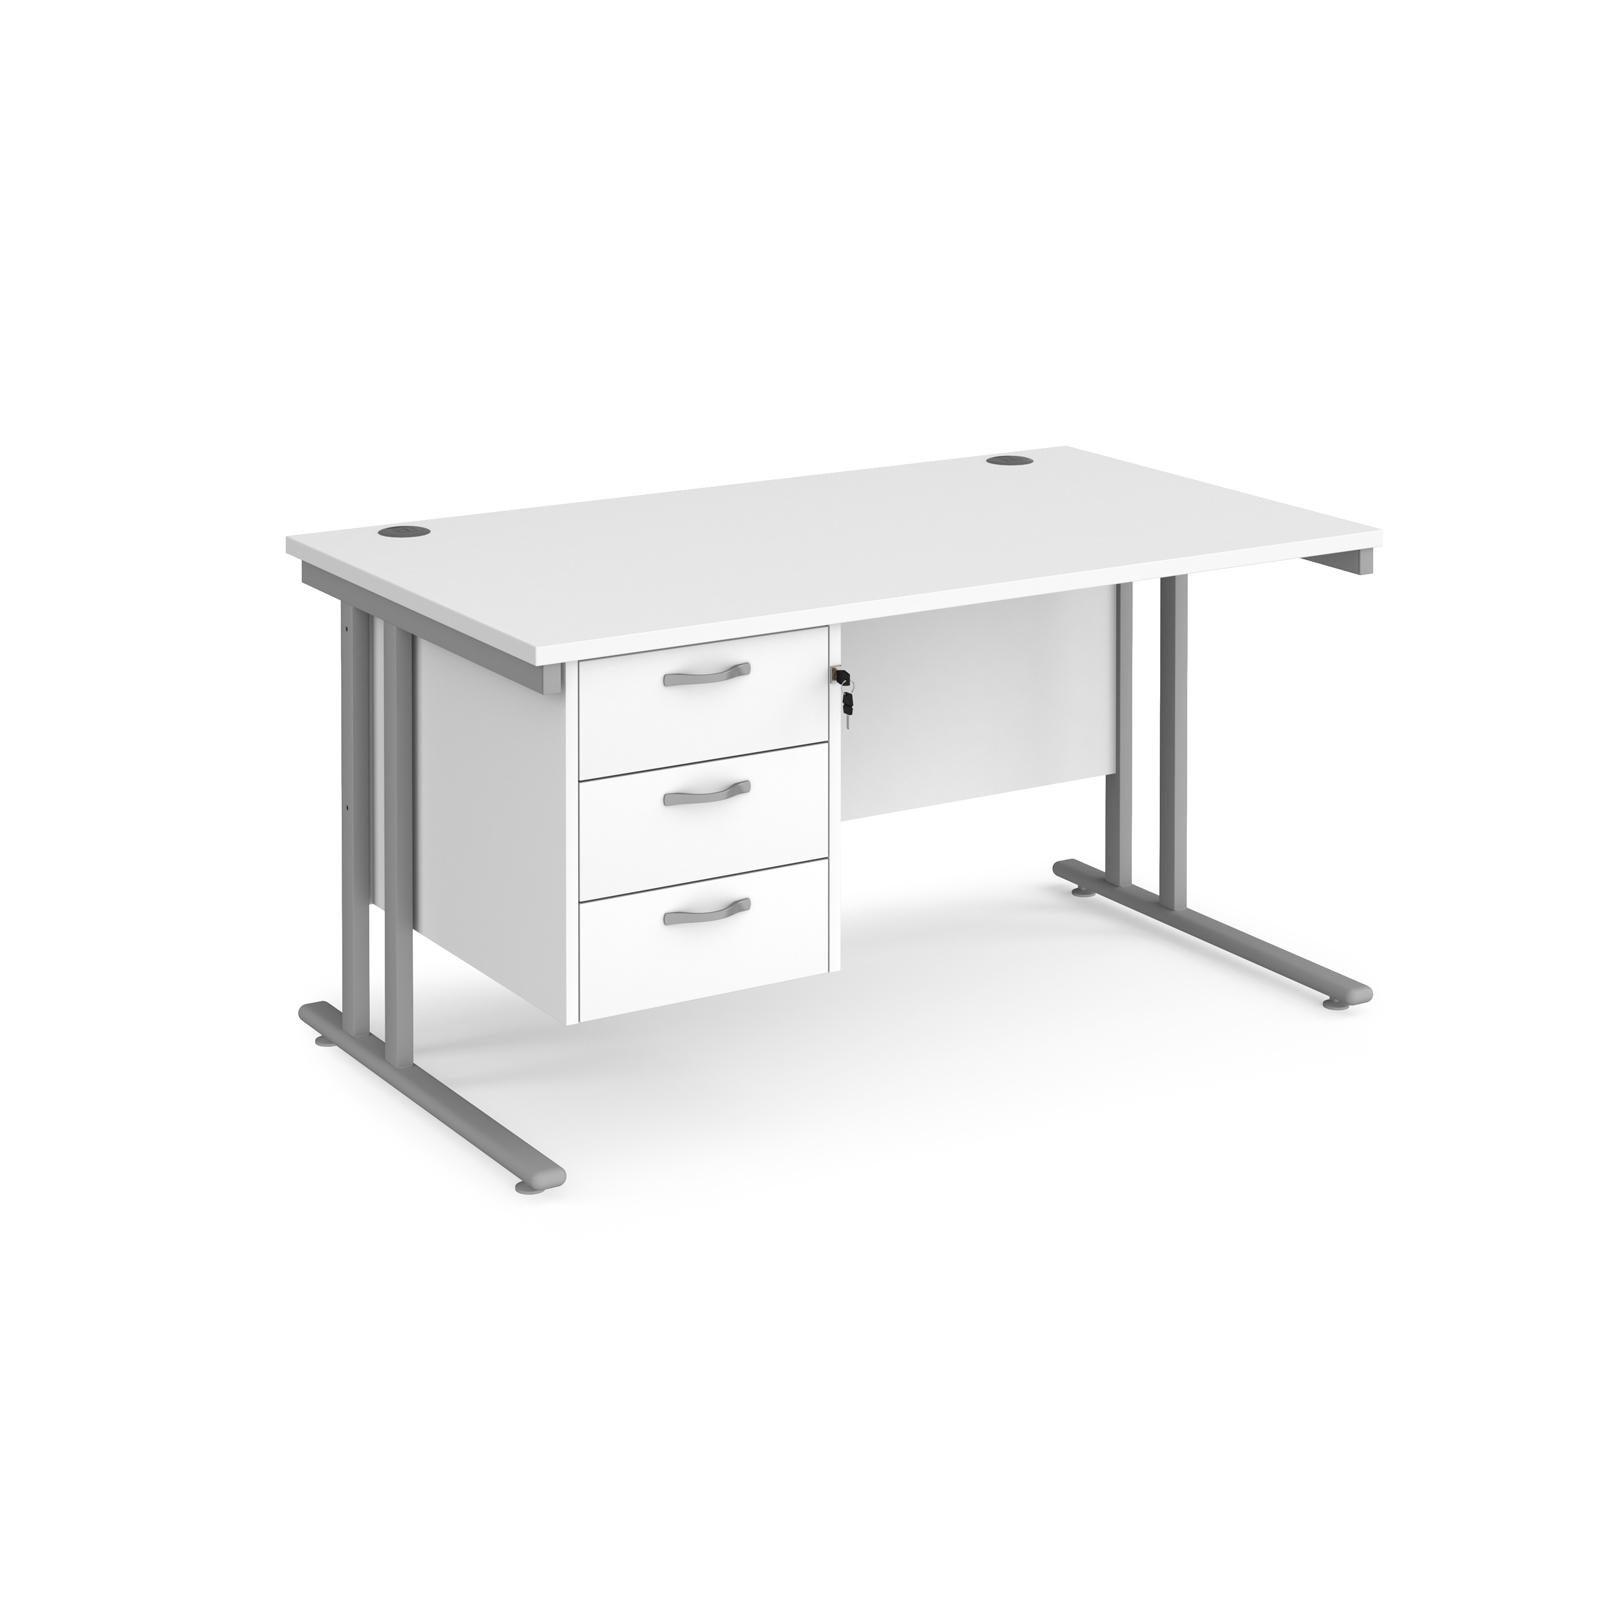 Rectangular Desks Maestro 25 straight desk 1400mm x 800mm with 3 drawer pedestal - silver cantilever leg frame, white top